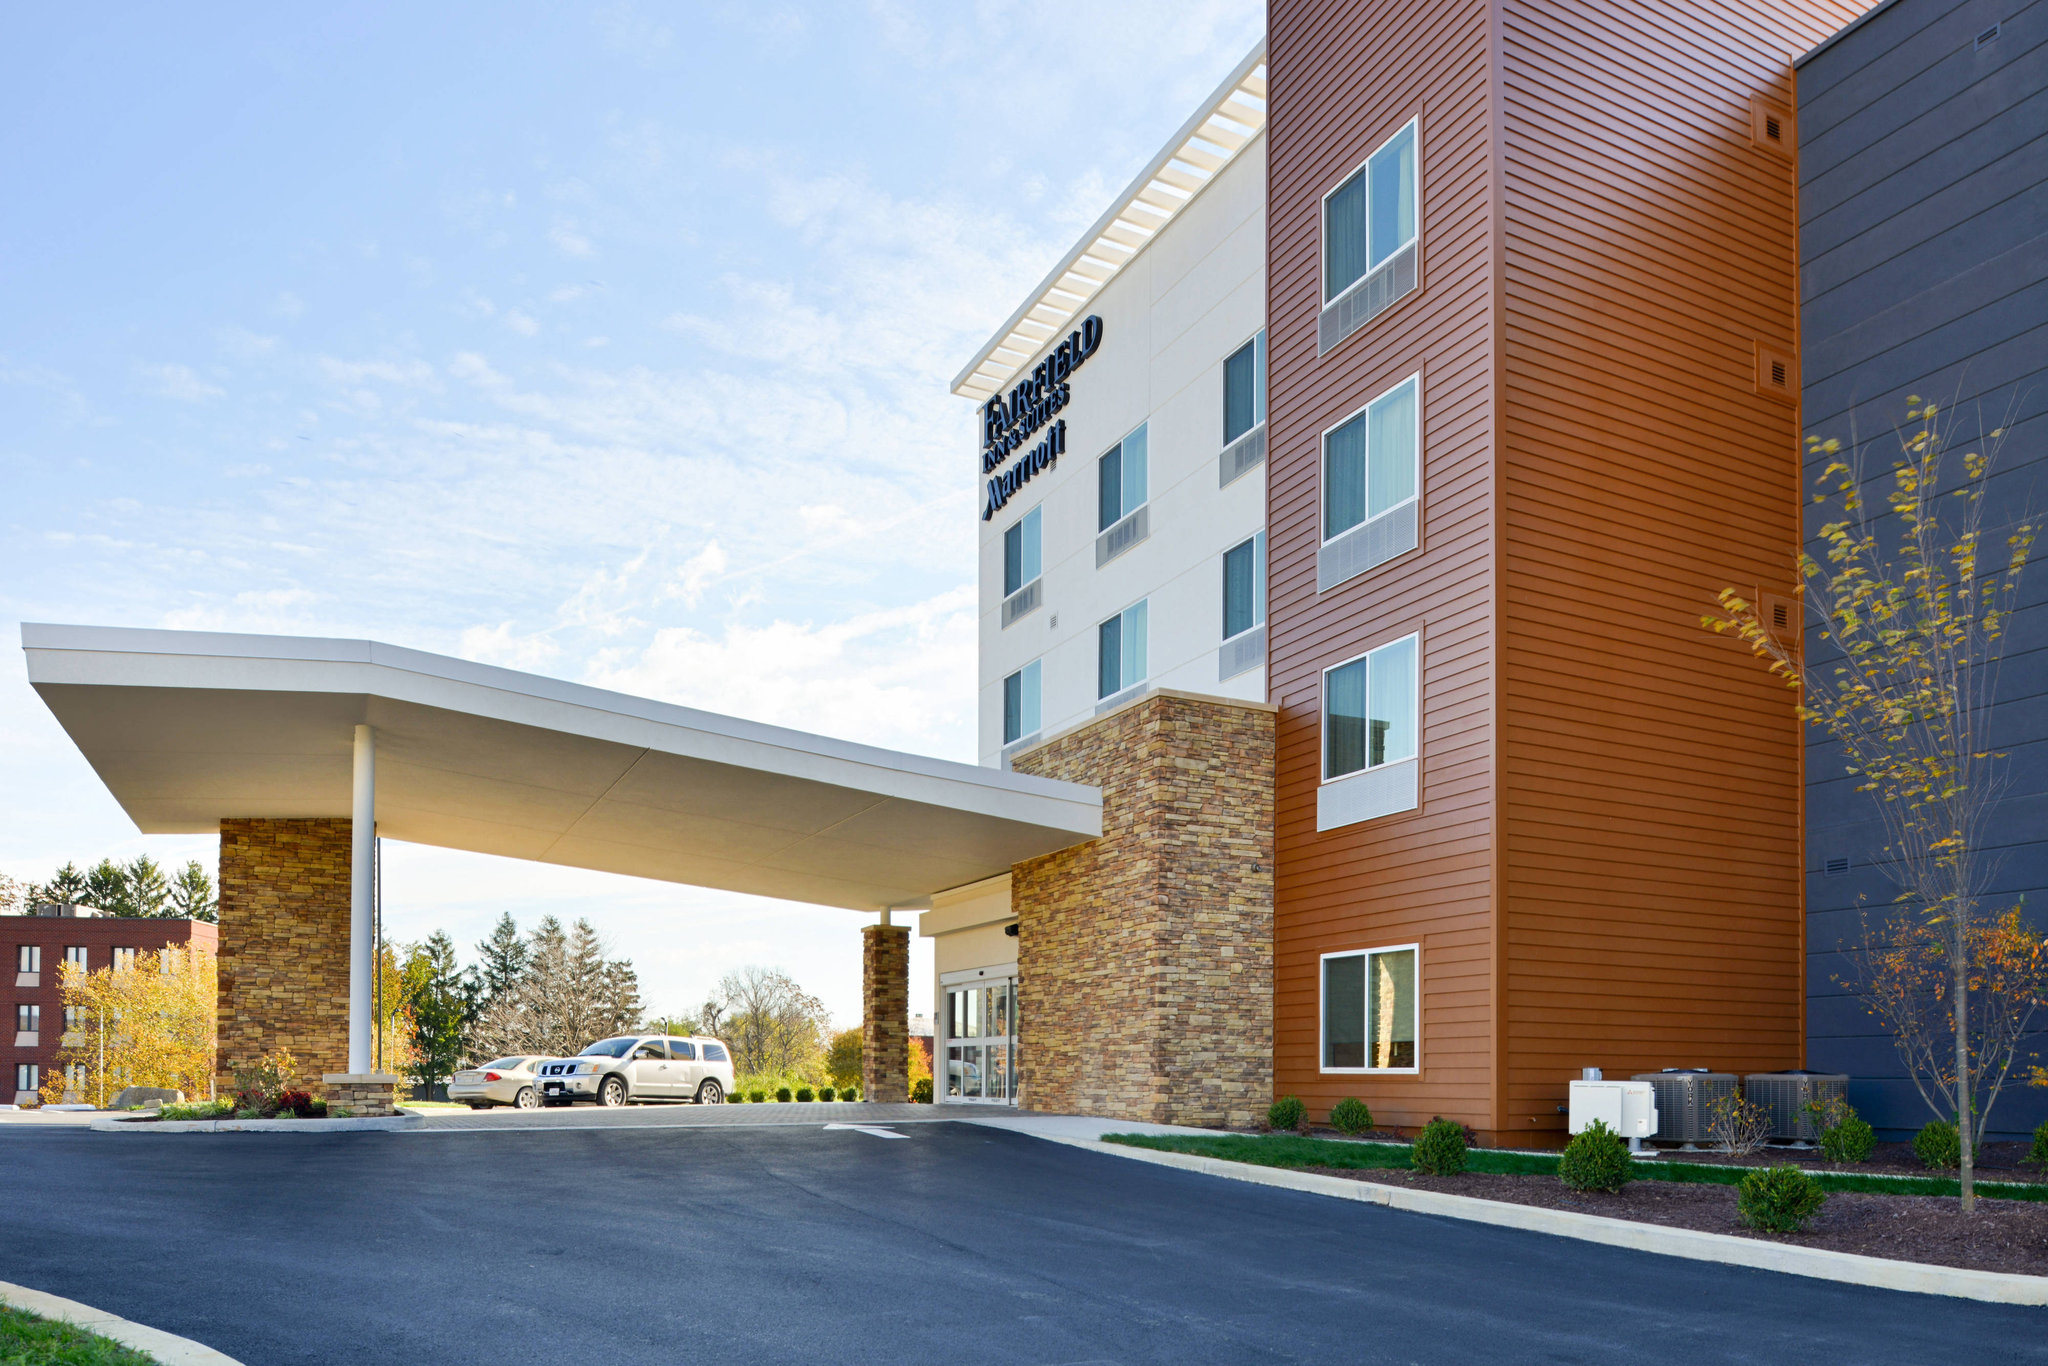 Fairfield Inn and Suites by Marriott Martinsburg